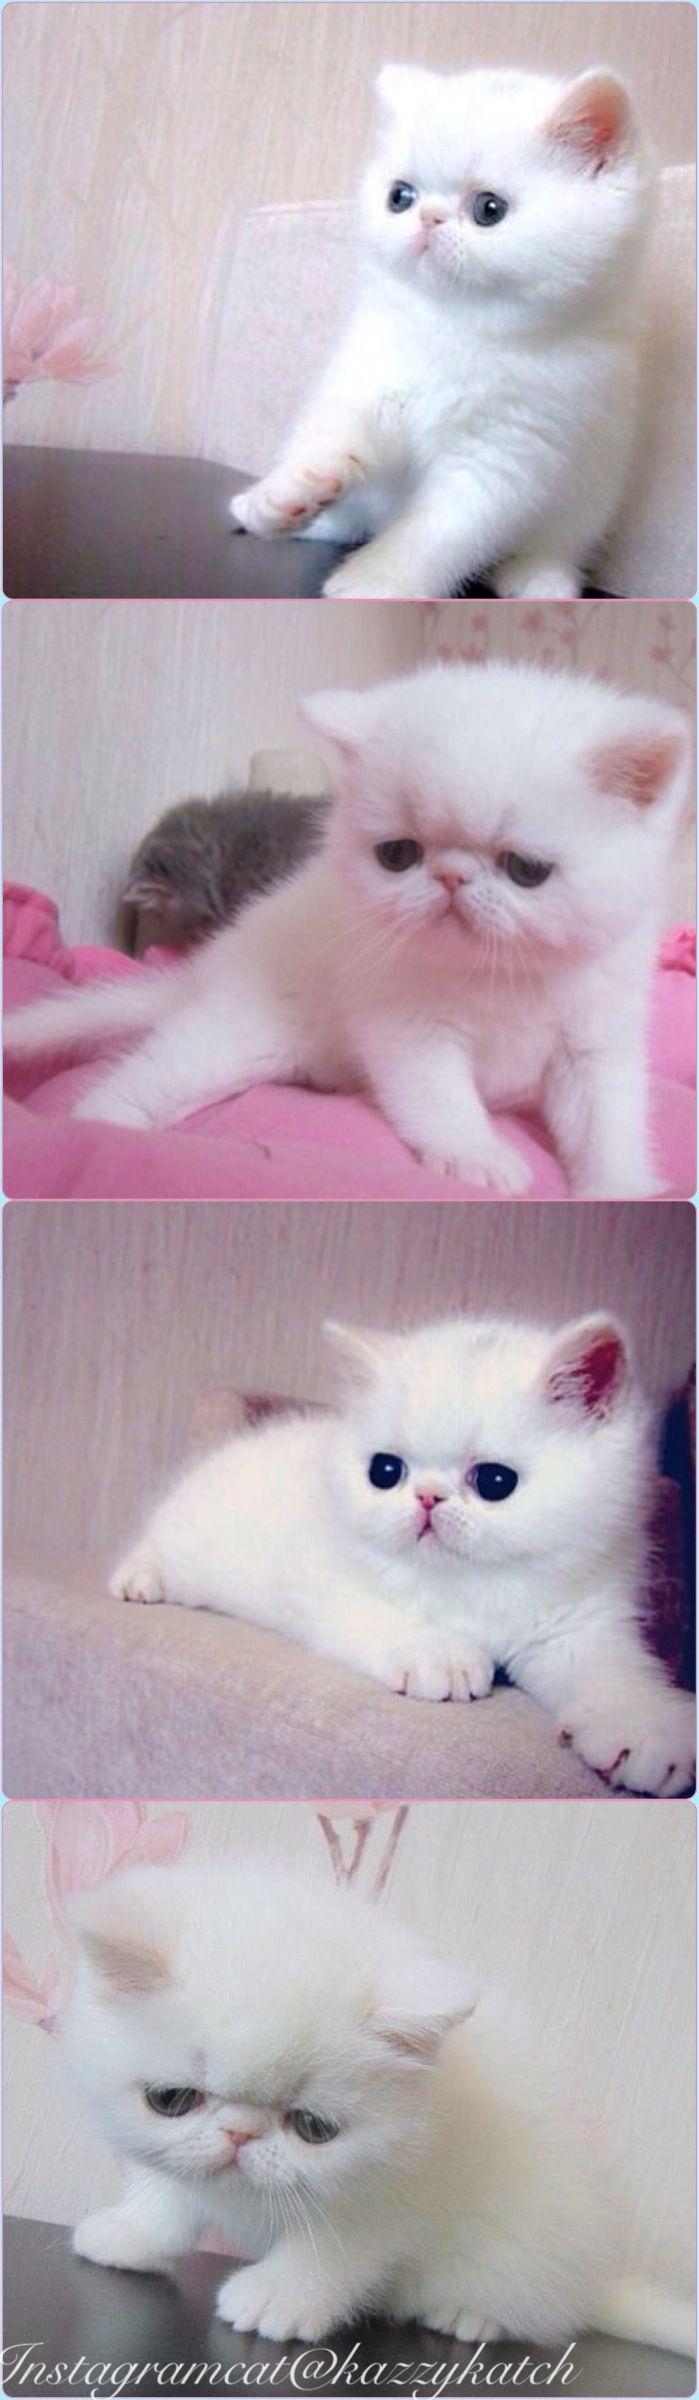 Pin On A Cat Dog Cute Cute